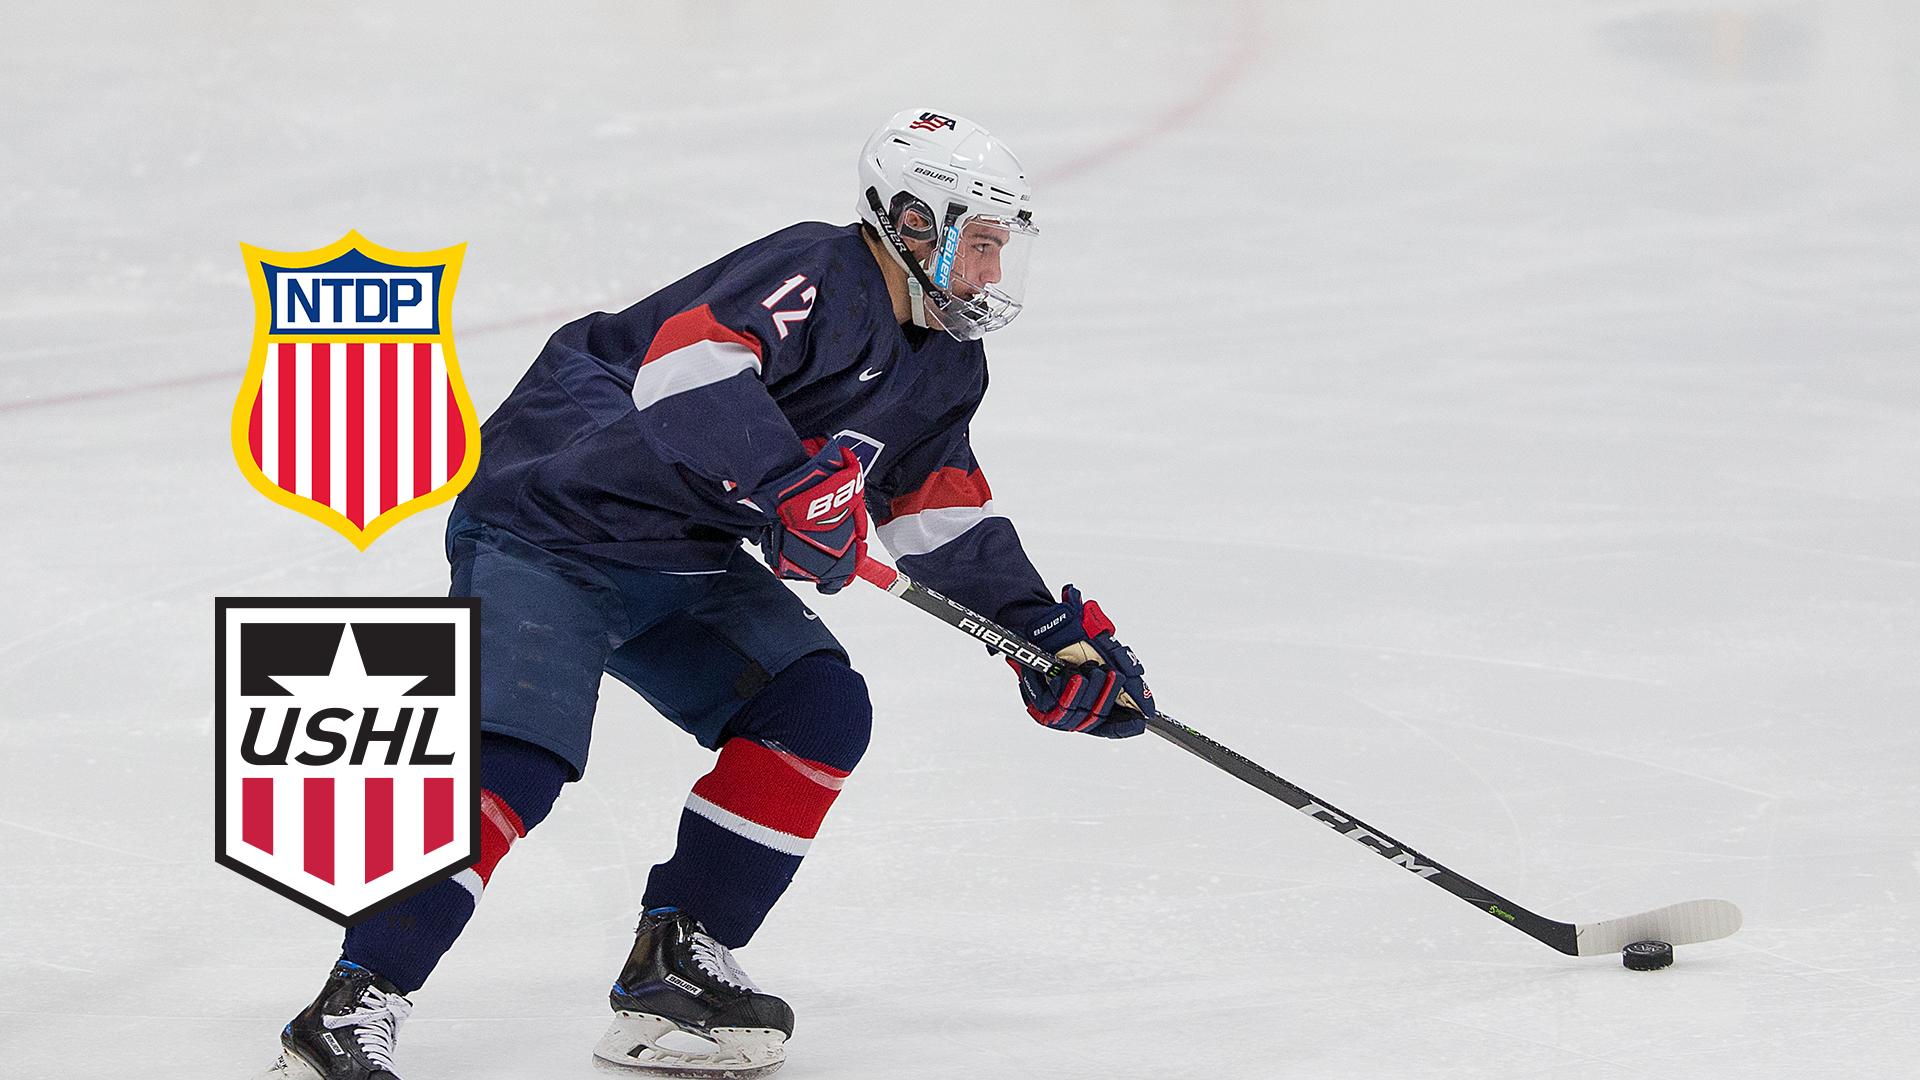 USHL: USA's Development Program Turning Heads With Youth